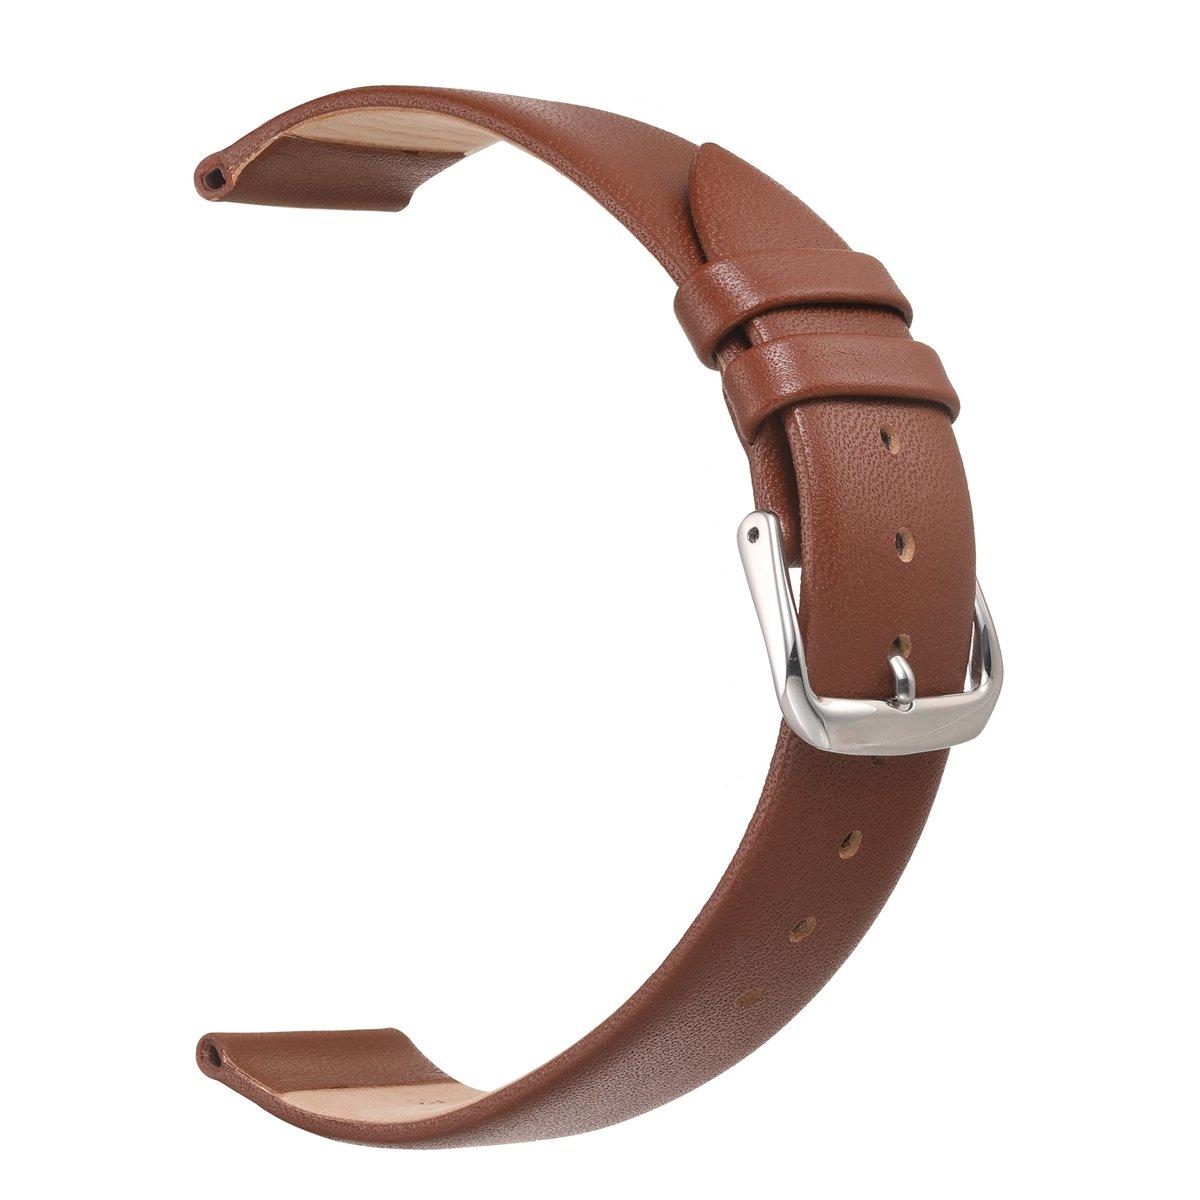 eache Classical超薄型本革バンド腕時計ストラップ異なる色 20mm ライトブラウン 20mm|ライトブラウン ライトブラウン 20mm B075JF3R17